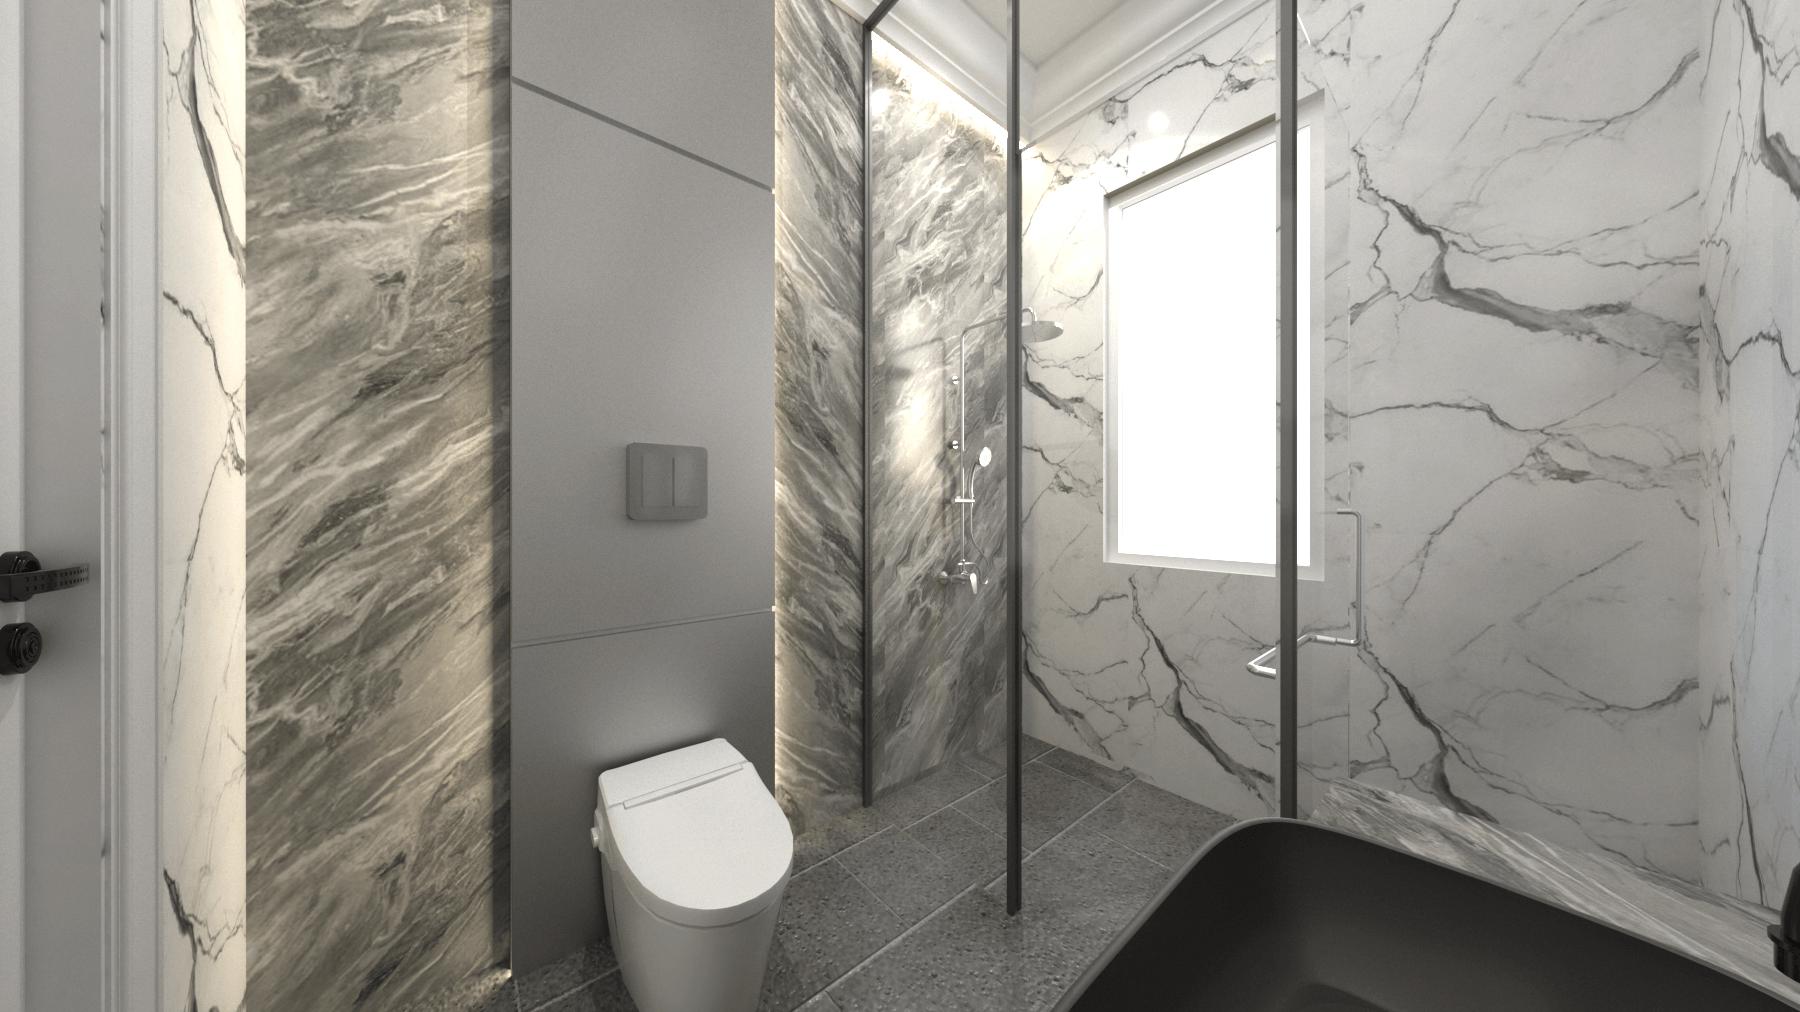 Mimic Concept Mr. Am - 2Nd Floor Jl. Pantai Indah Kapuk, Rt.6/rw.2, Kamal Muara, Kec. Penjaringan, Kota Jkt Utara, Daerah Khusus Ibukota Jakarta, Indonesia Jl. Pantai Indah Kapuk, Rt.6/rw.2, Kamal Muara, Kec. Penjaringan, Kota Jkt Utara, Daerah Khusus Ibukota Jakarta, Indonesia Bathroom Kid View 2  <P>Theme : Luxury Modern</p> <P>Material : Matble + Ducco + Hpl&nbsp;</p> 92601